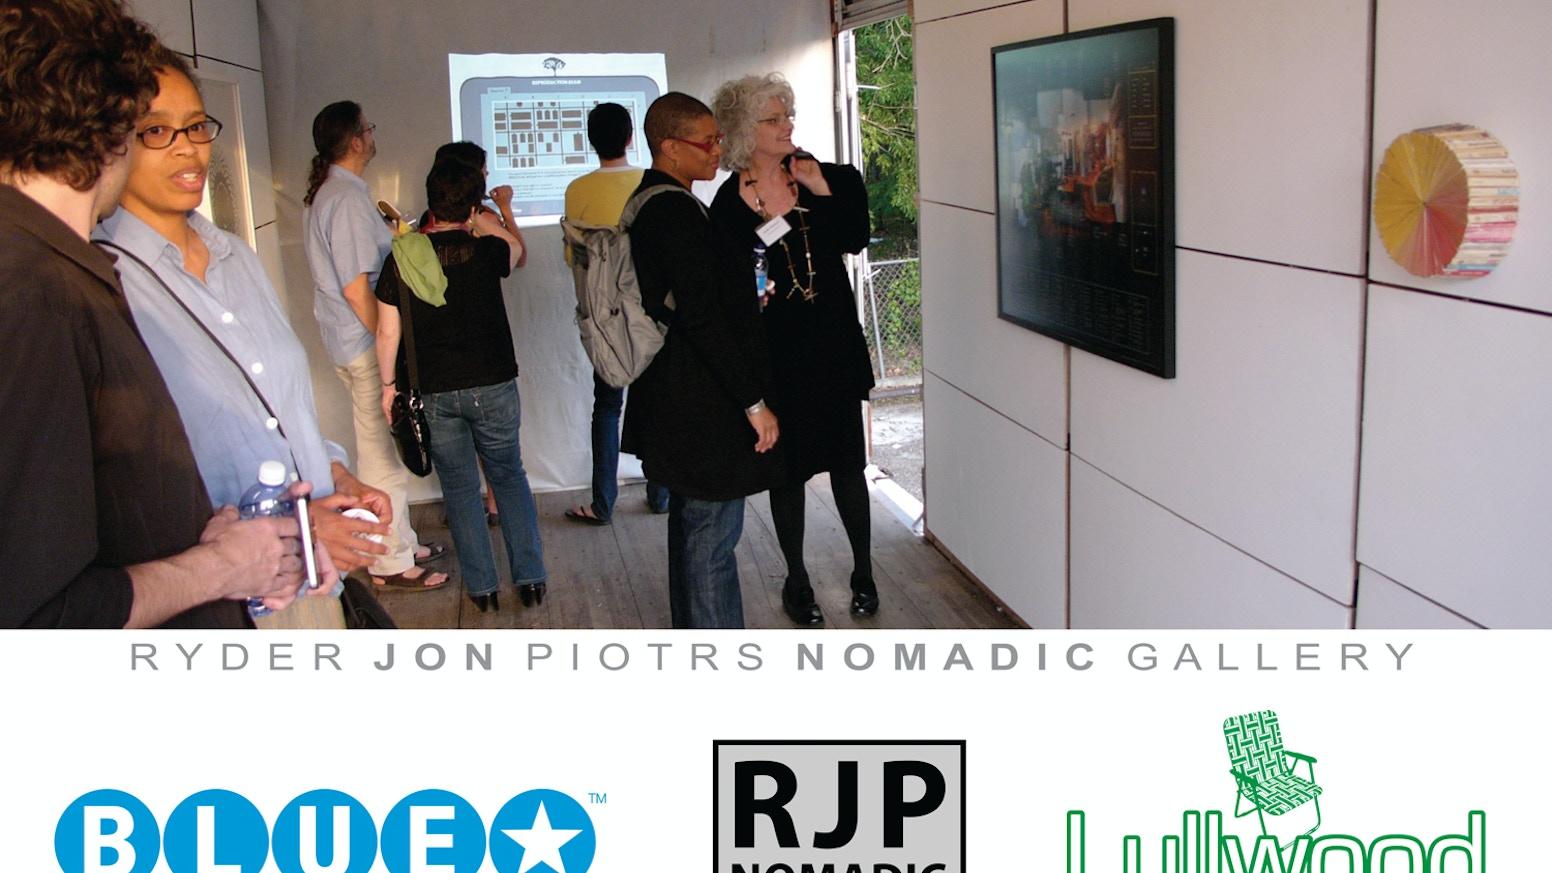 Bring Rjp Nomadic Gallery To San Antonio By Lullwood